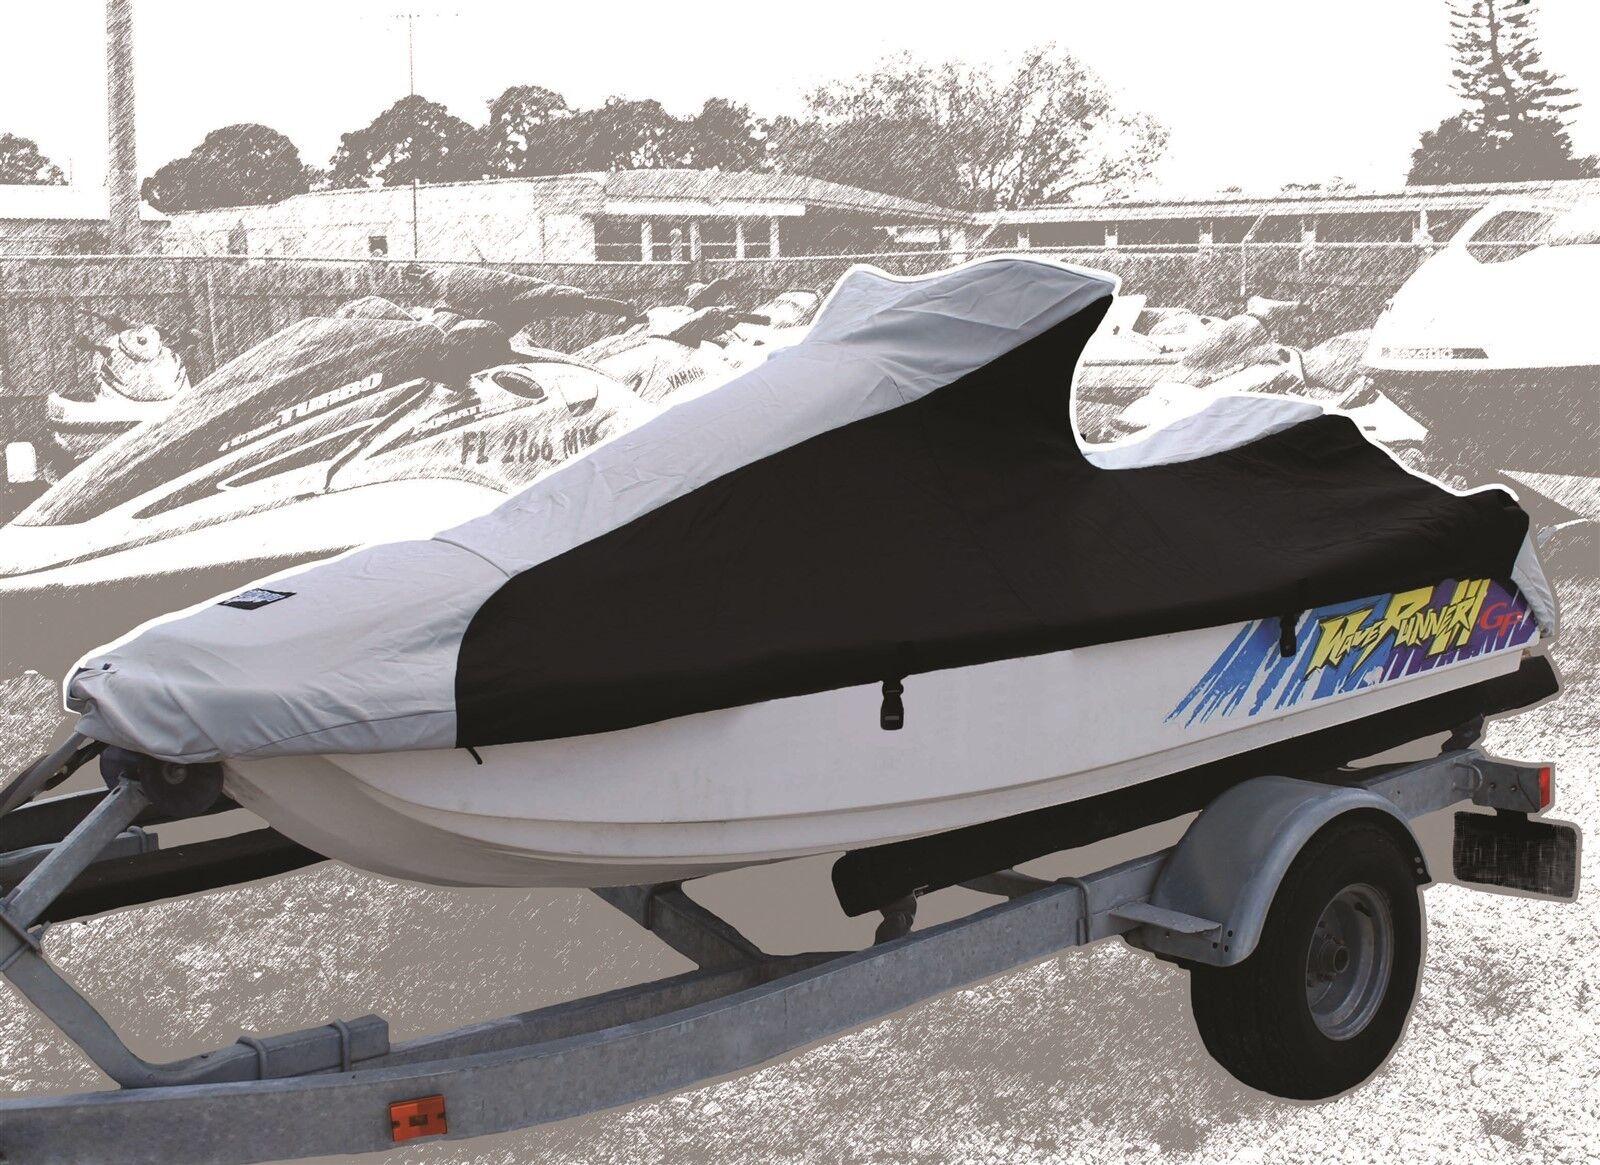 Yamaha Jet Ski Storage Cover 1990-1997 Wave Runner III 1995 Wave Runner III GP